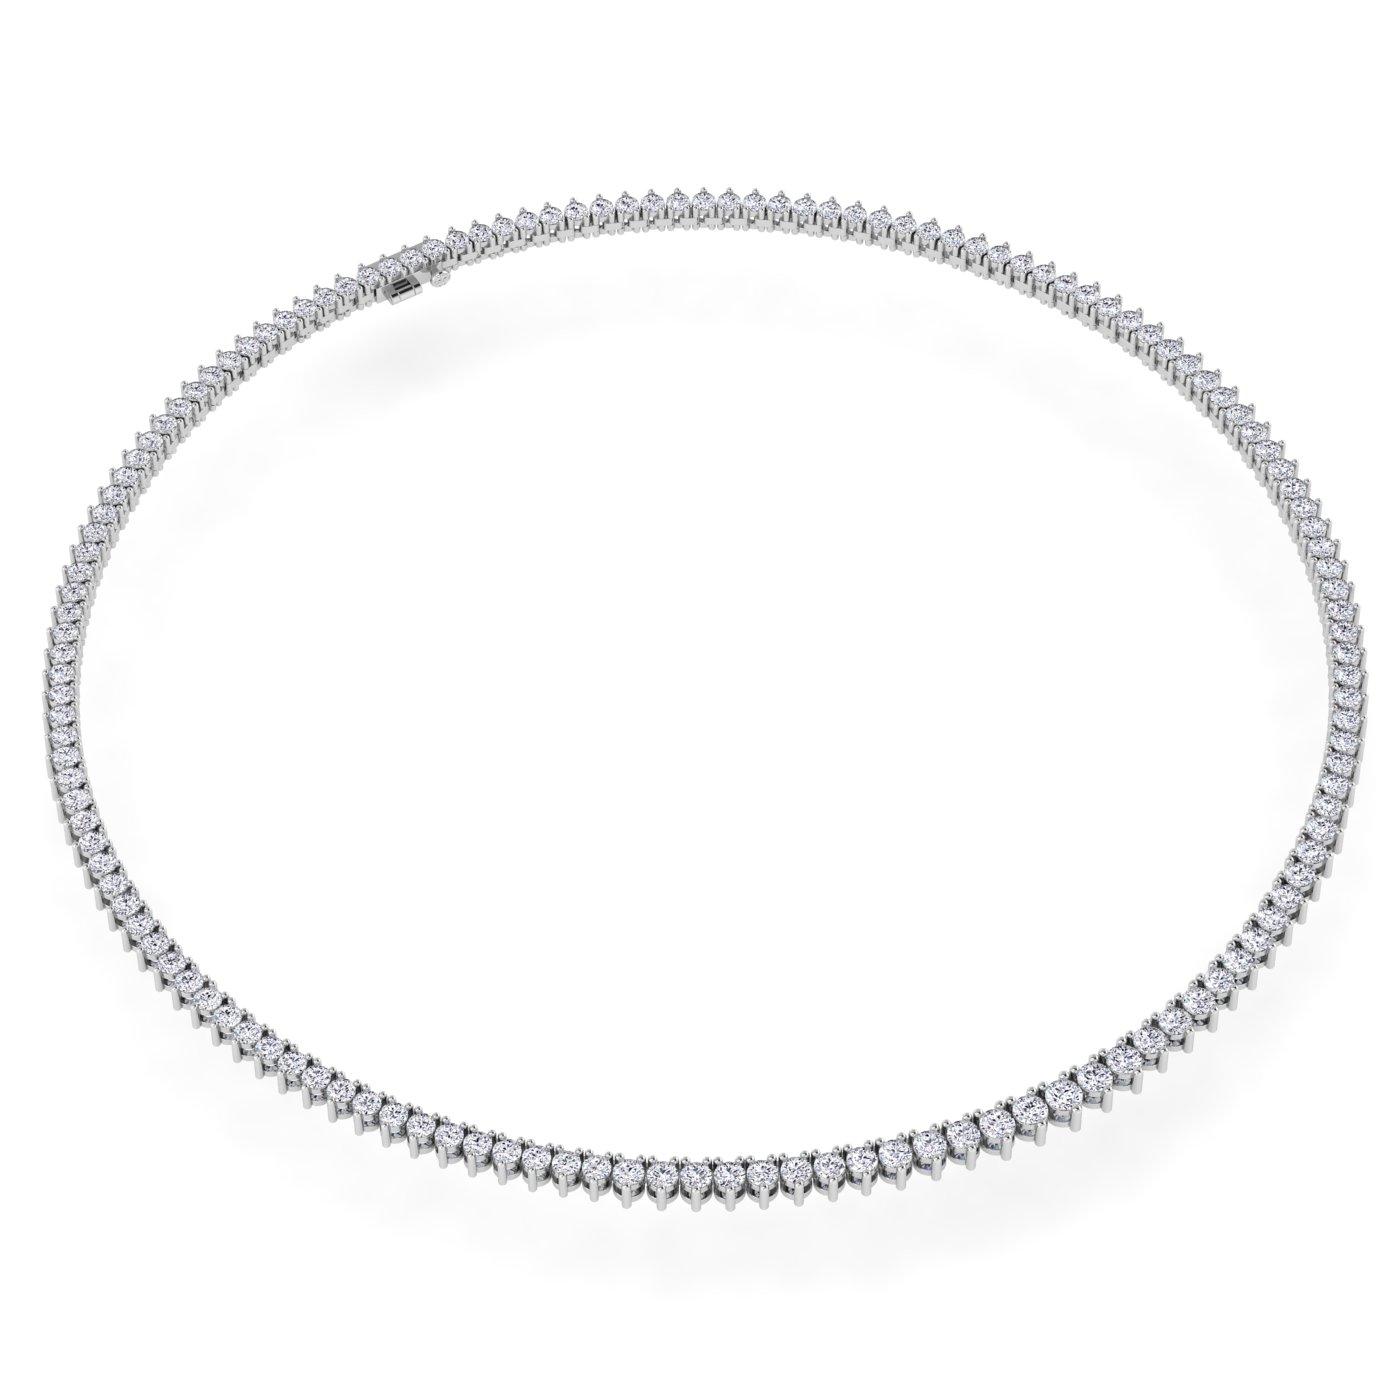 14K White Gold Lab Grown Diamond Tennis Necklace (10.48 TCW)